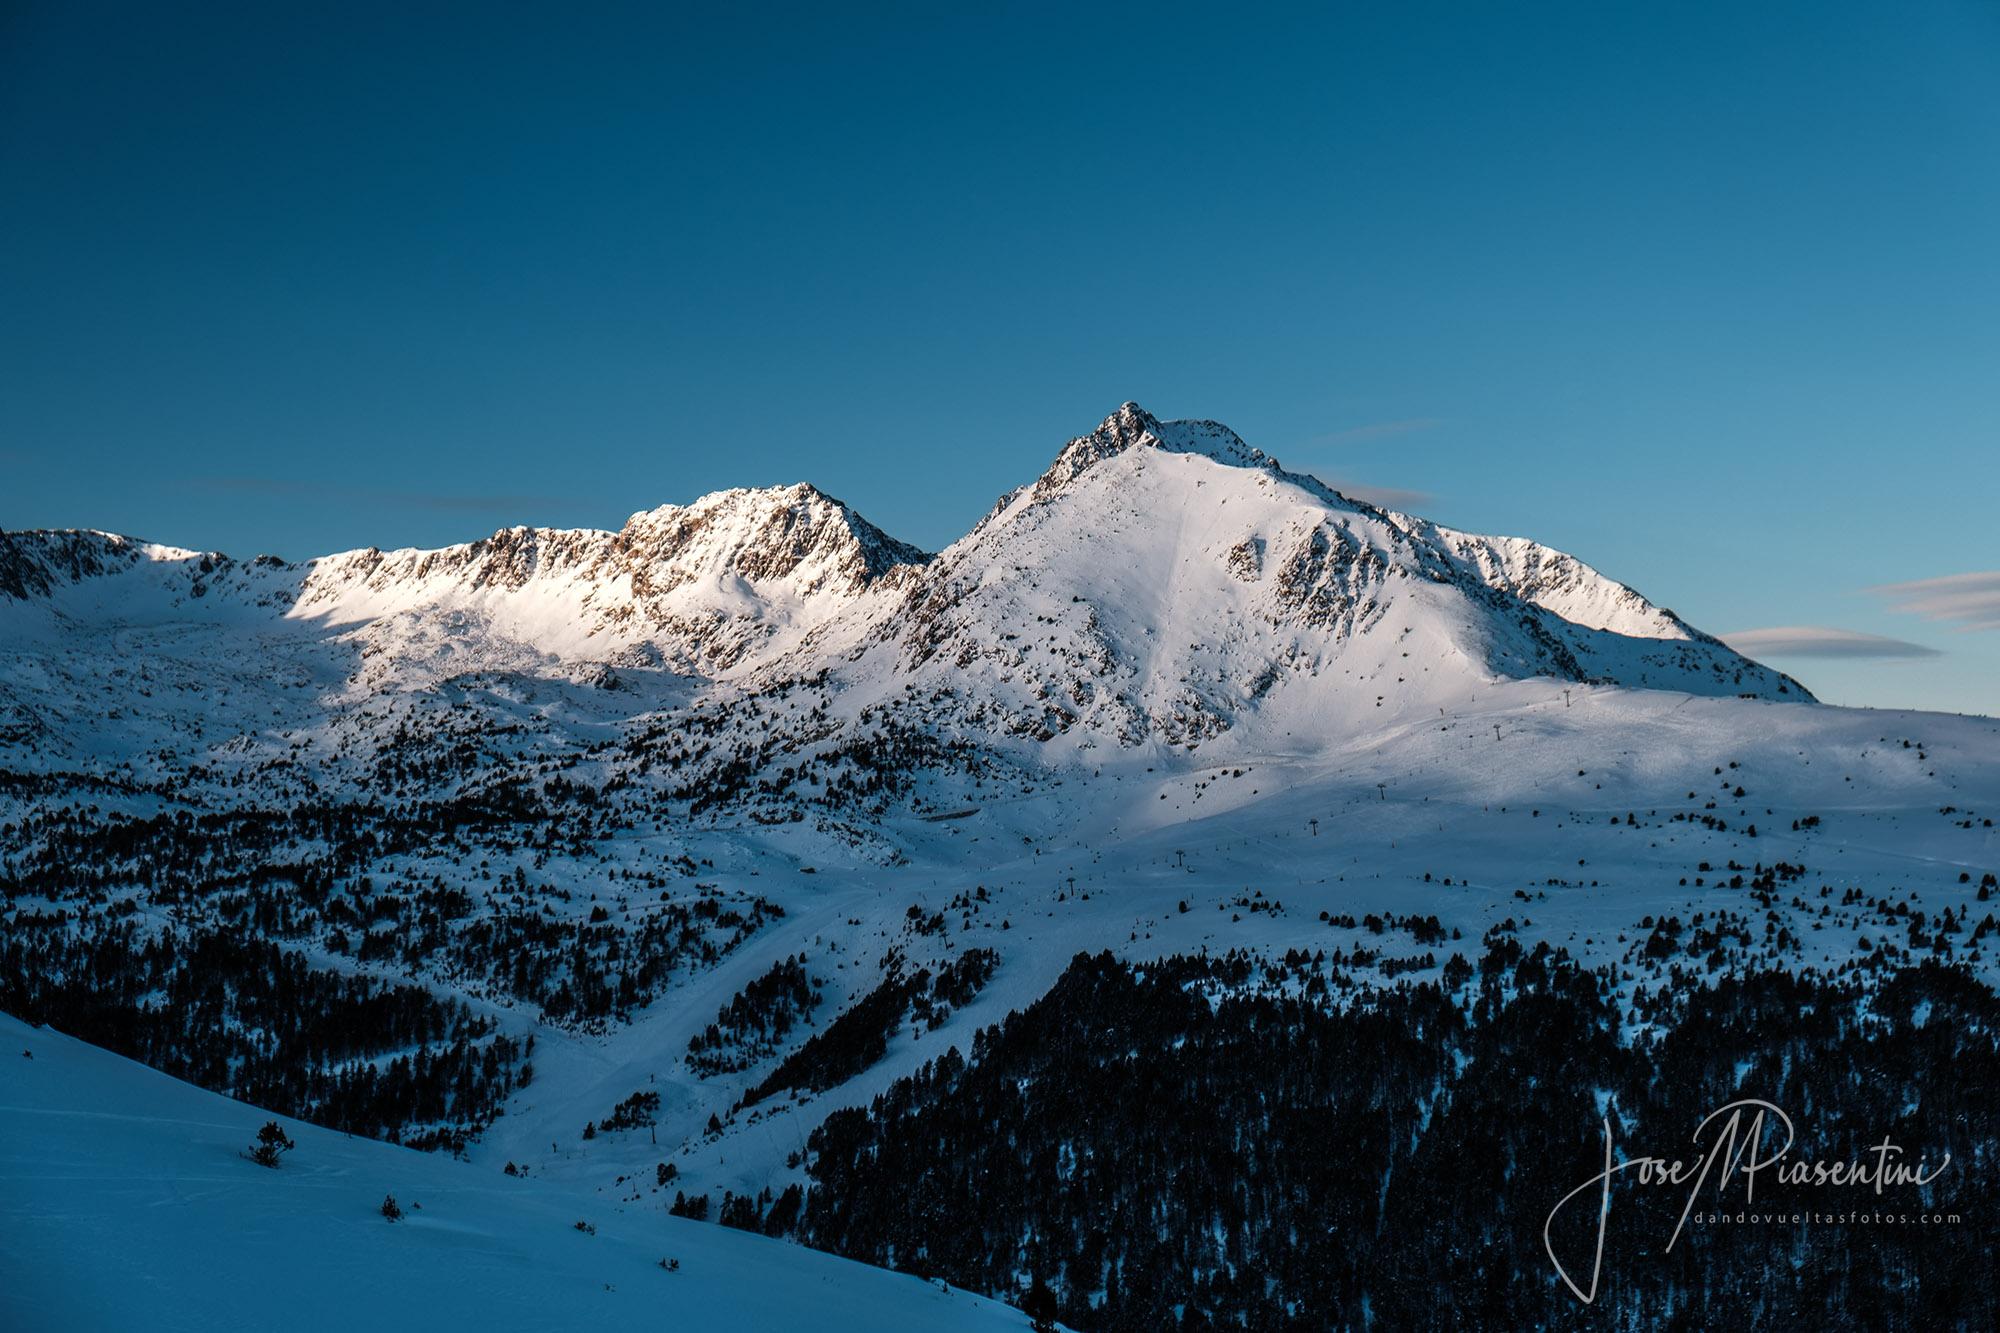 Andorra Landscape pictures